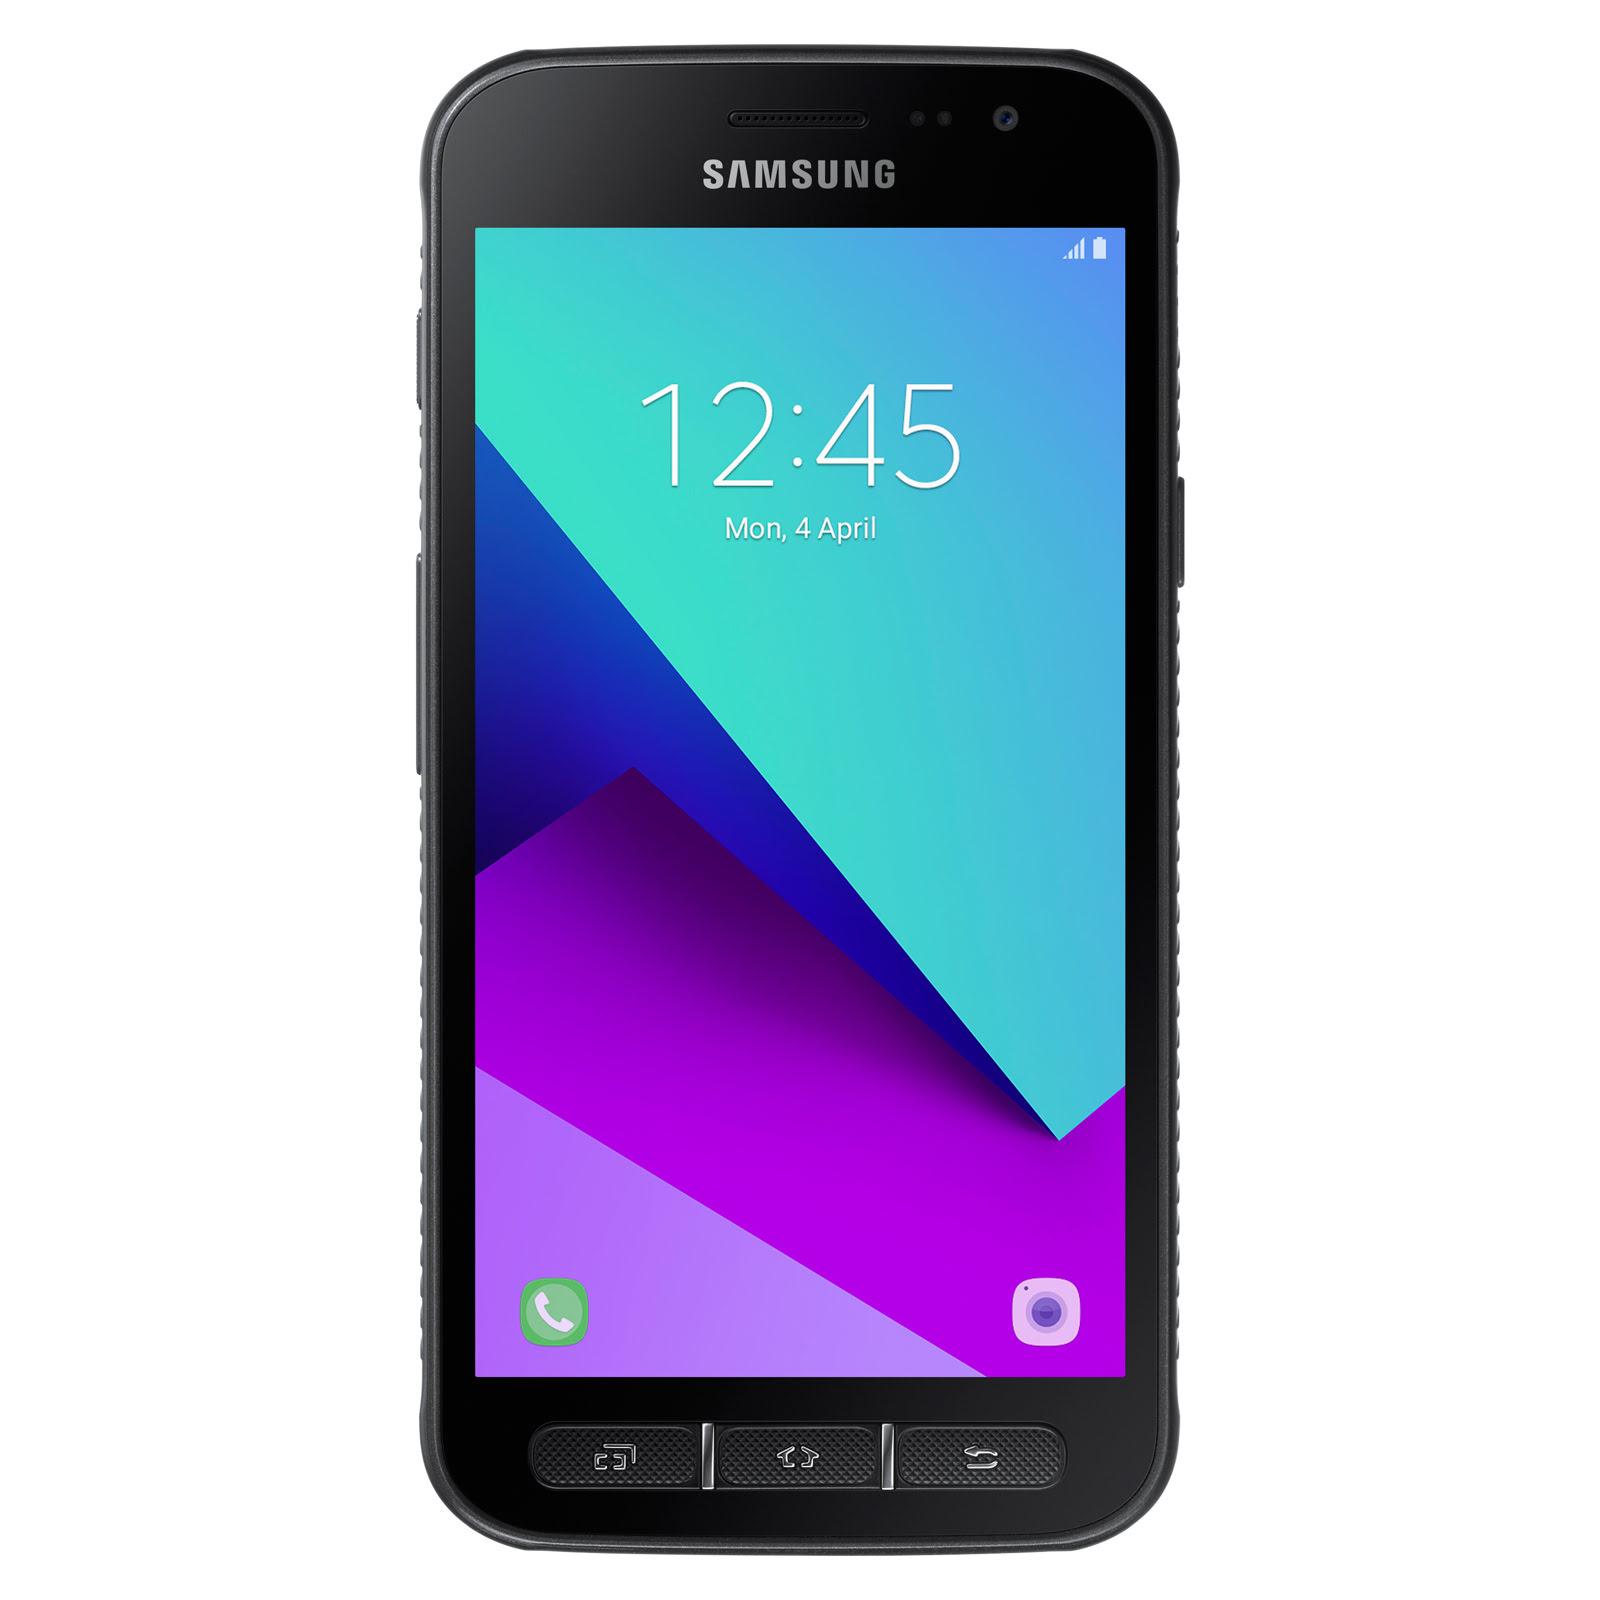 Samsung Galaxy Xcover 4 16Go G390 Black - Téléphonie Samsung - 0